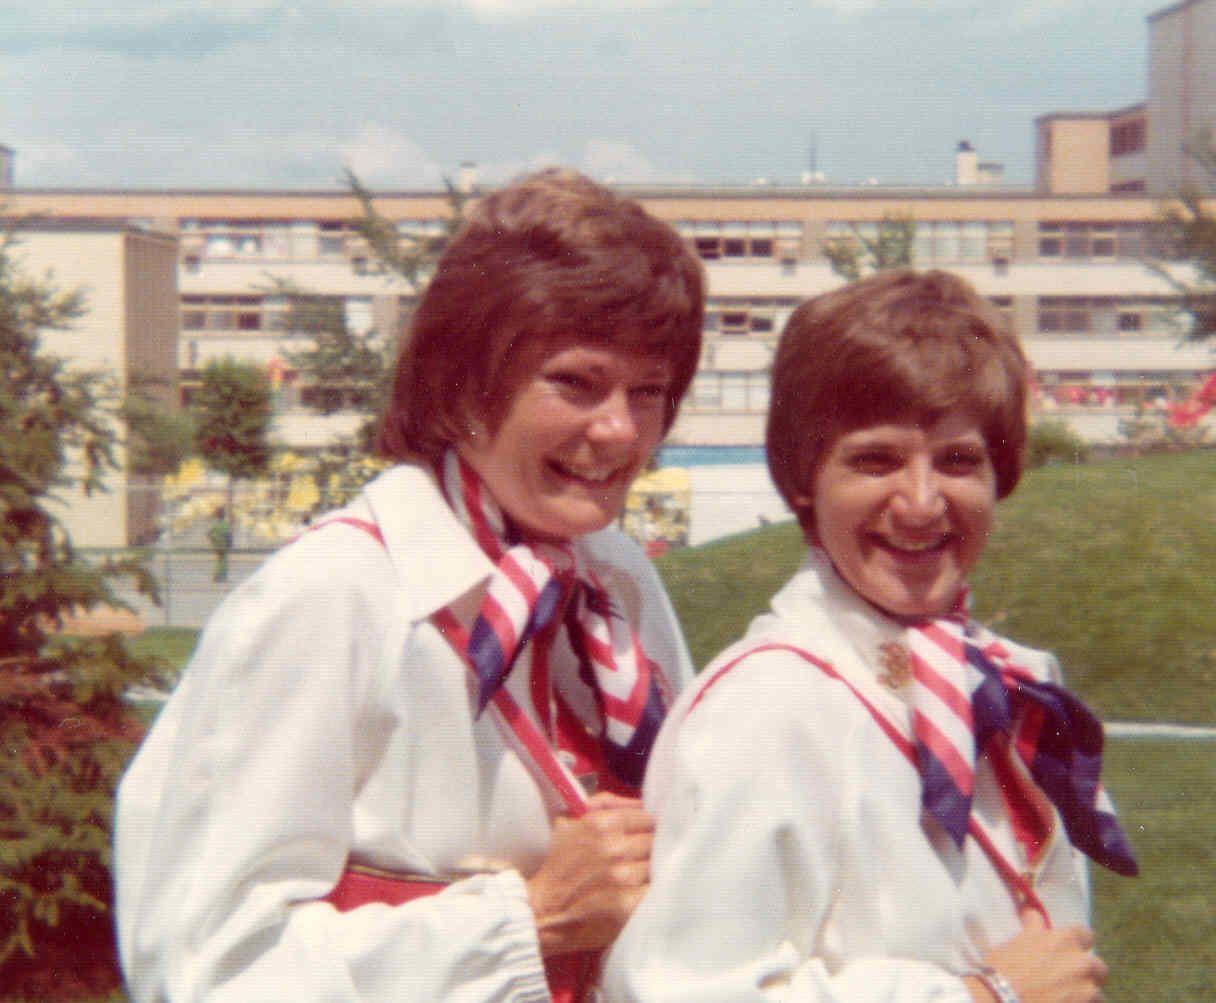 Co-captains Pat Head and Juliene Simpson share a smile.